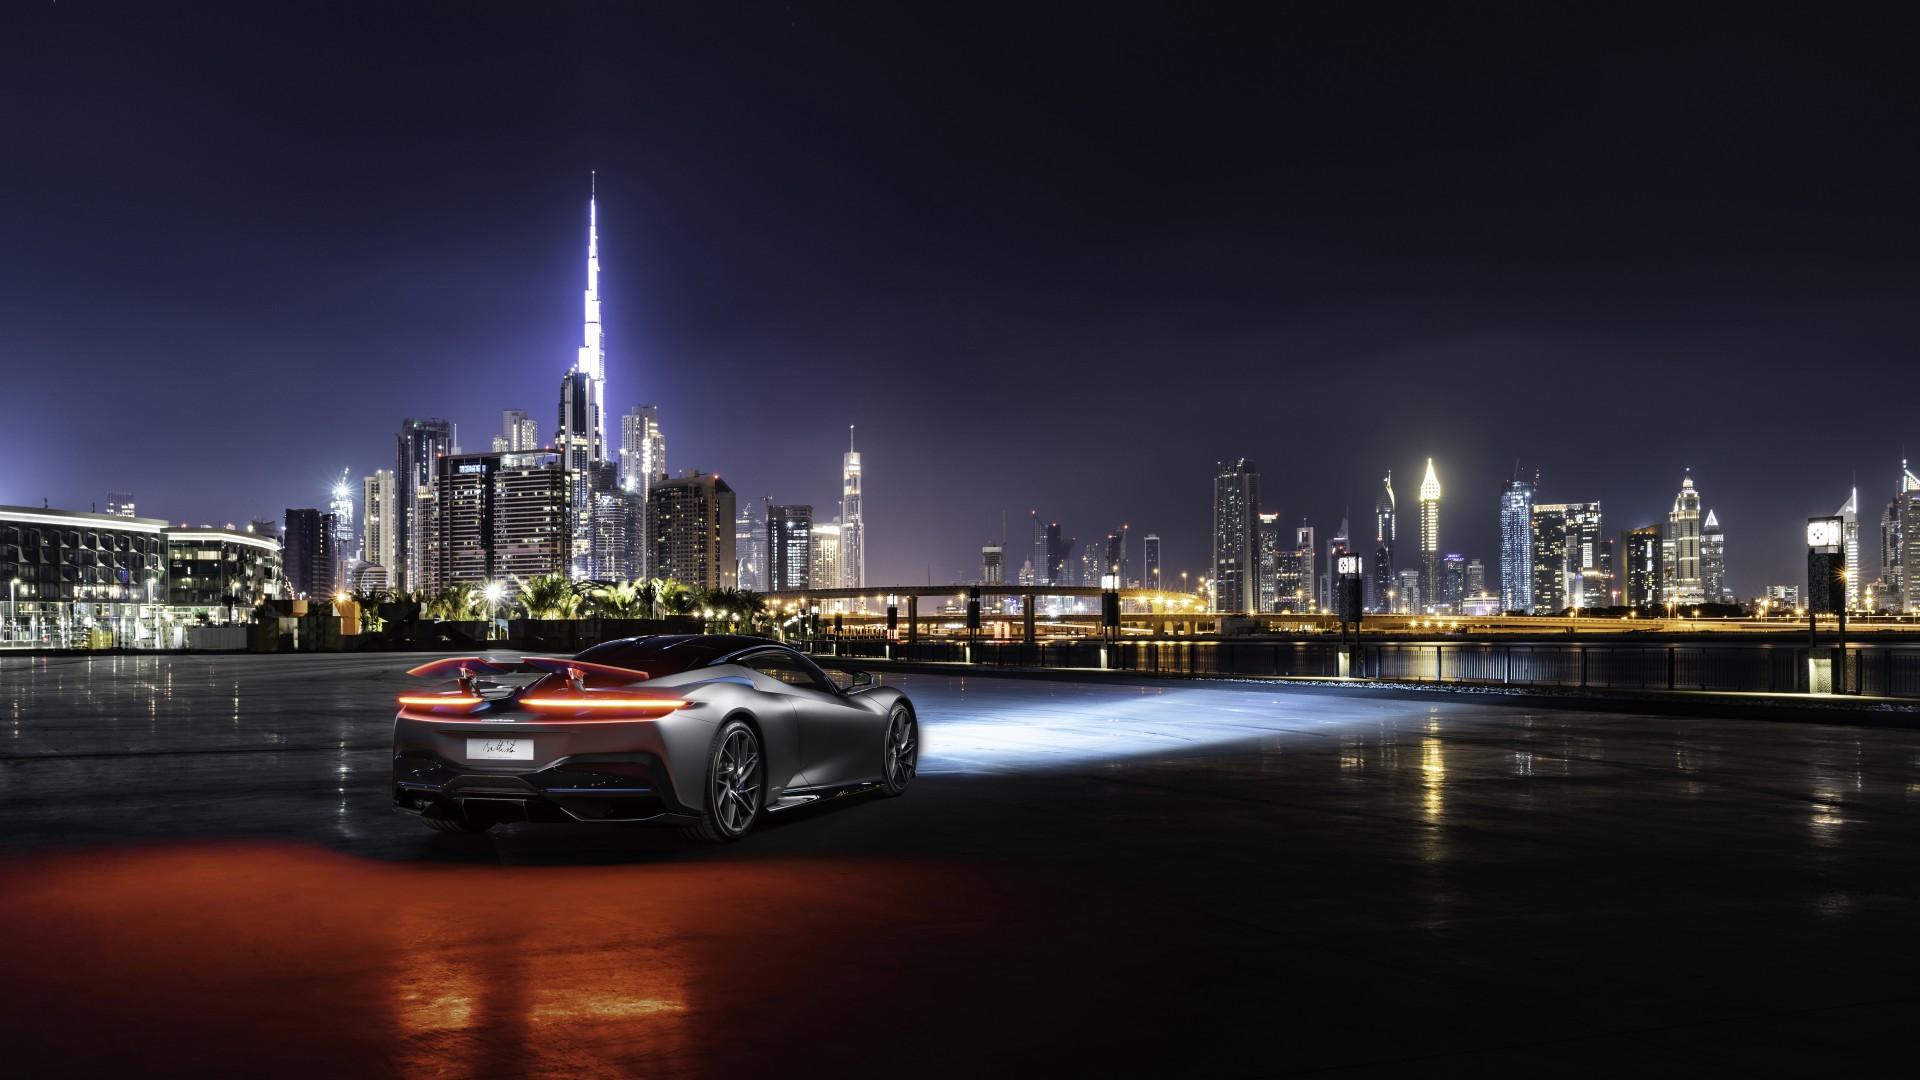 Pininfarina Battista 2019 Dubai 4K 8K Wallpaper | HD Car ...